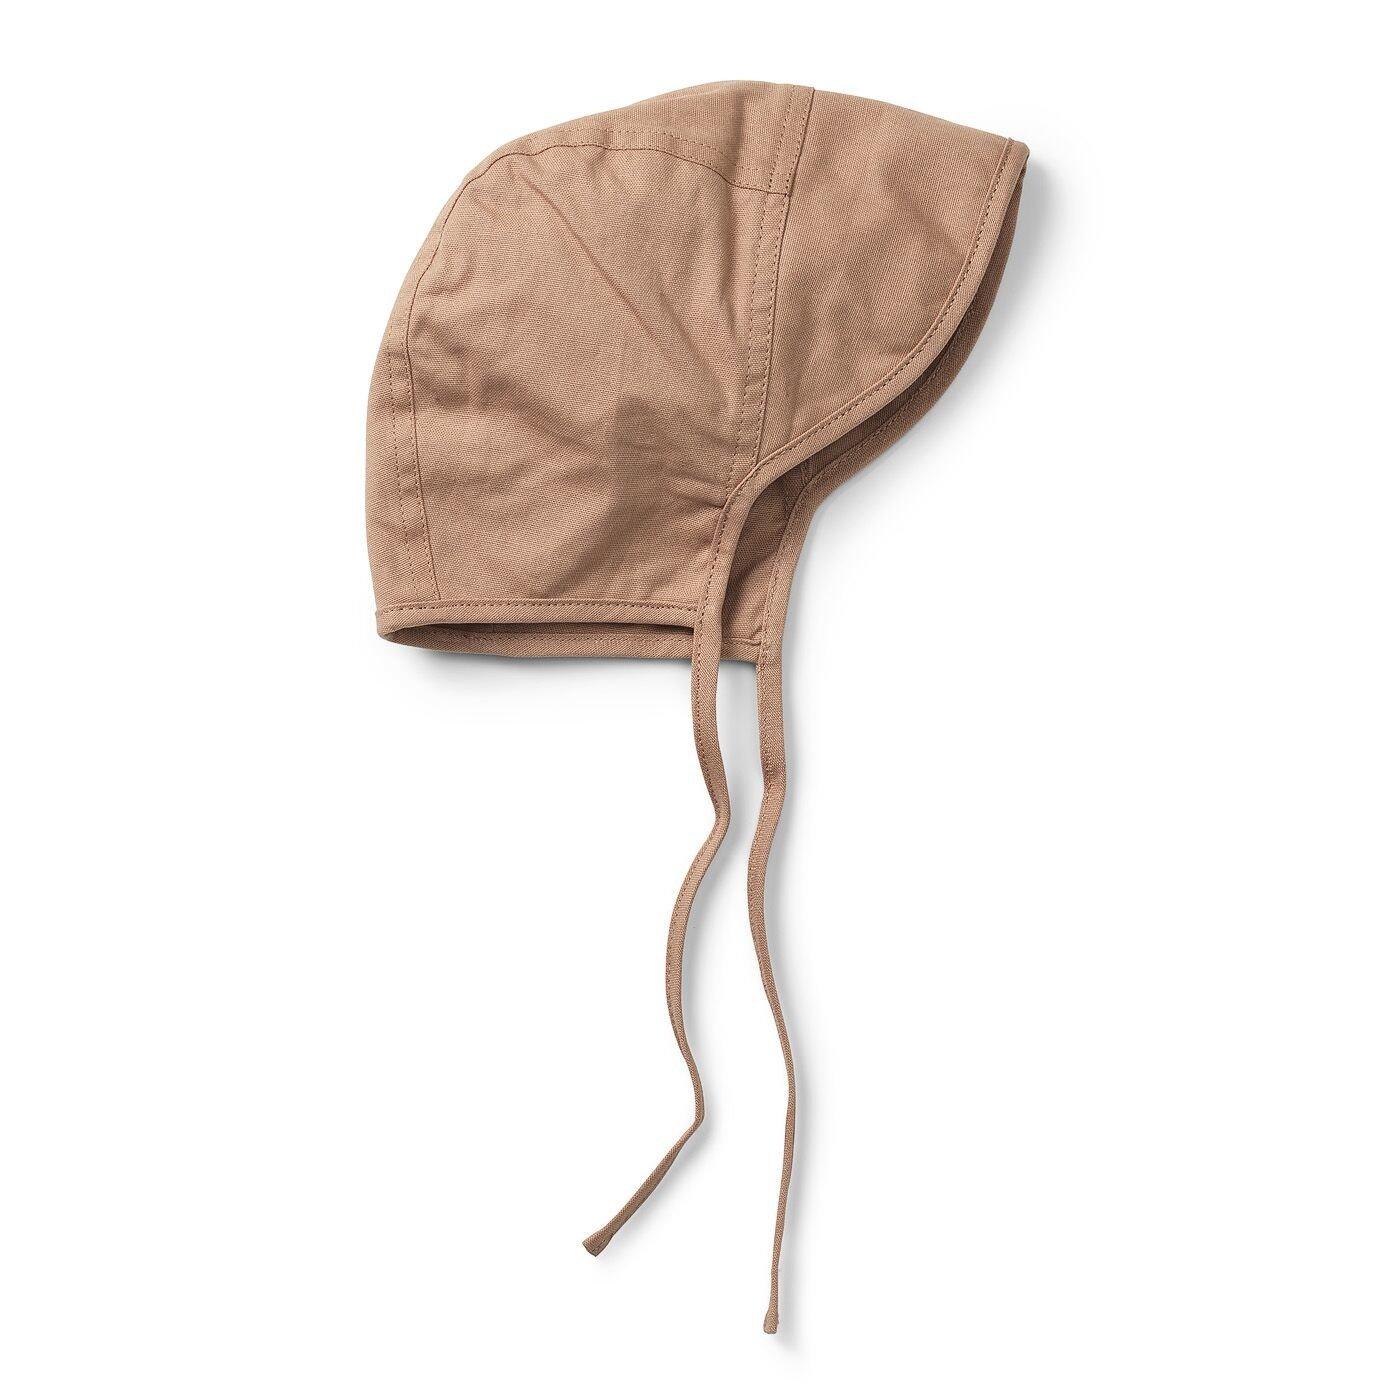 Elodie Details - Czapka Baby Bonnet - Faded Rose 6-12 m-cy